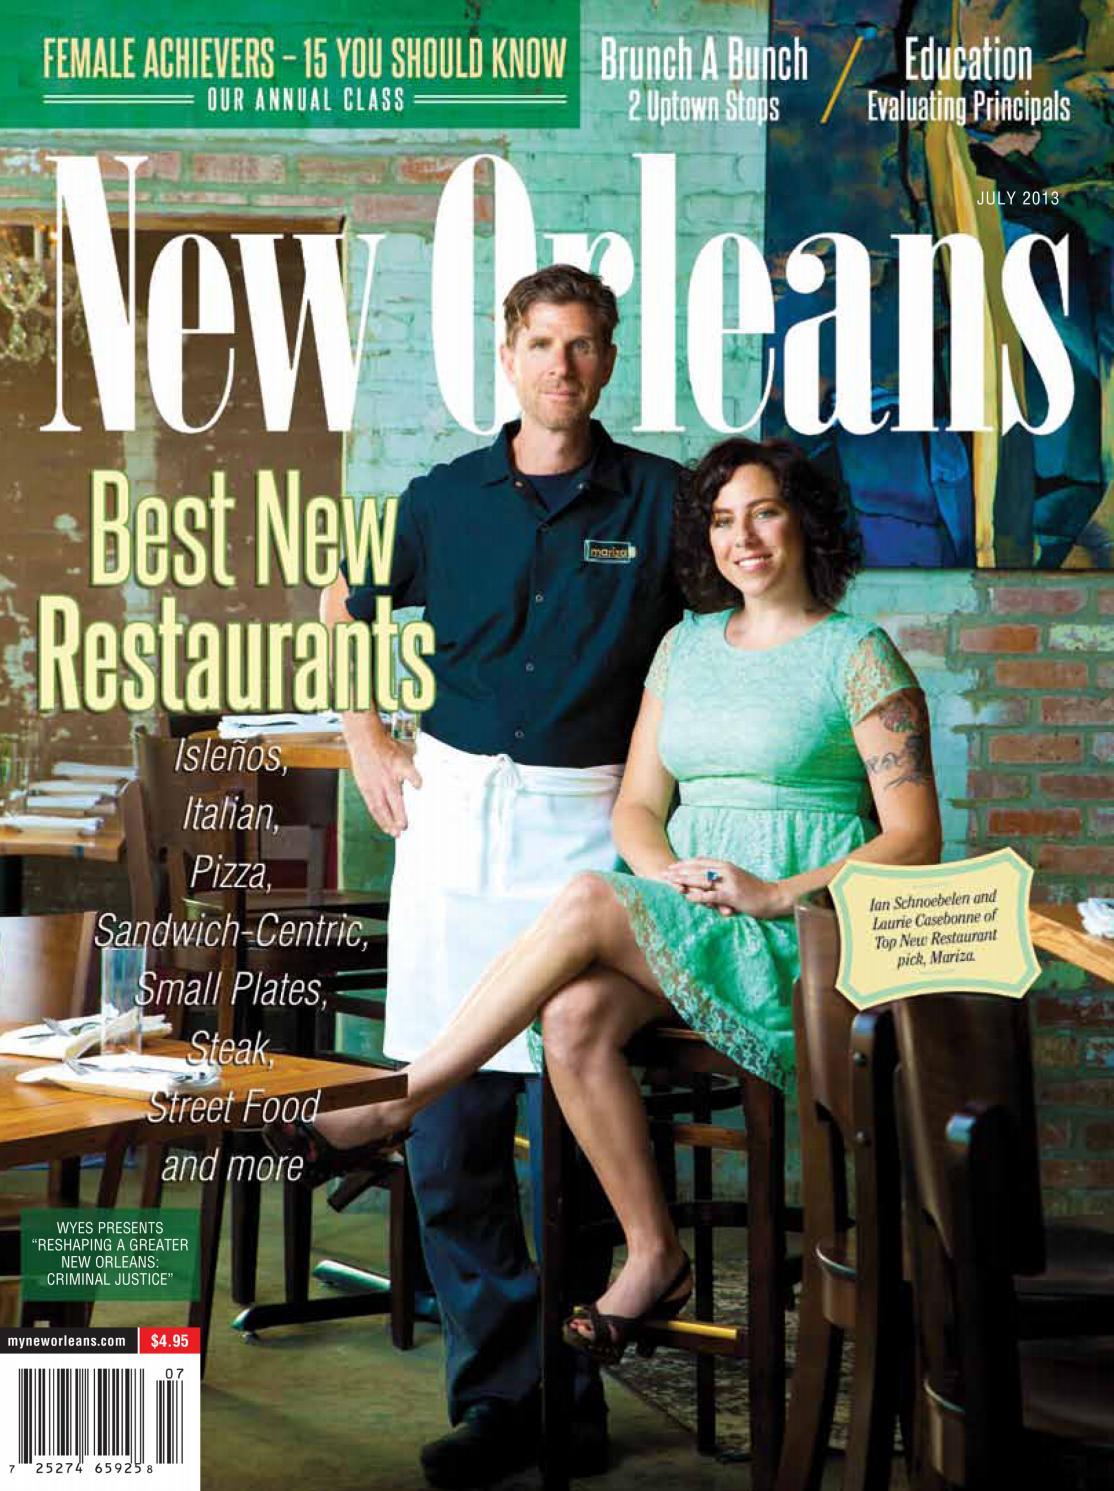 New Orleans Magazine July 2013 By Renaissance Publishing Issuu Elliott choy is on mixcloud. new orleans magazine july 2013 by